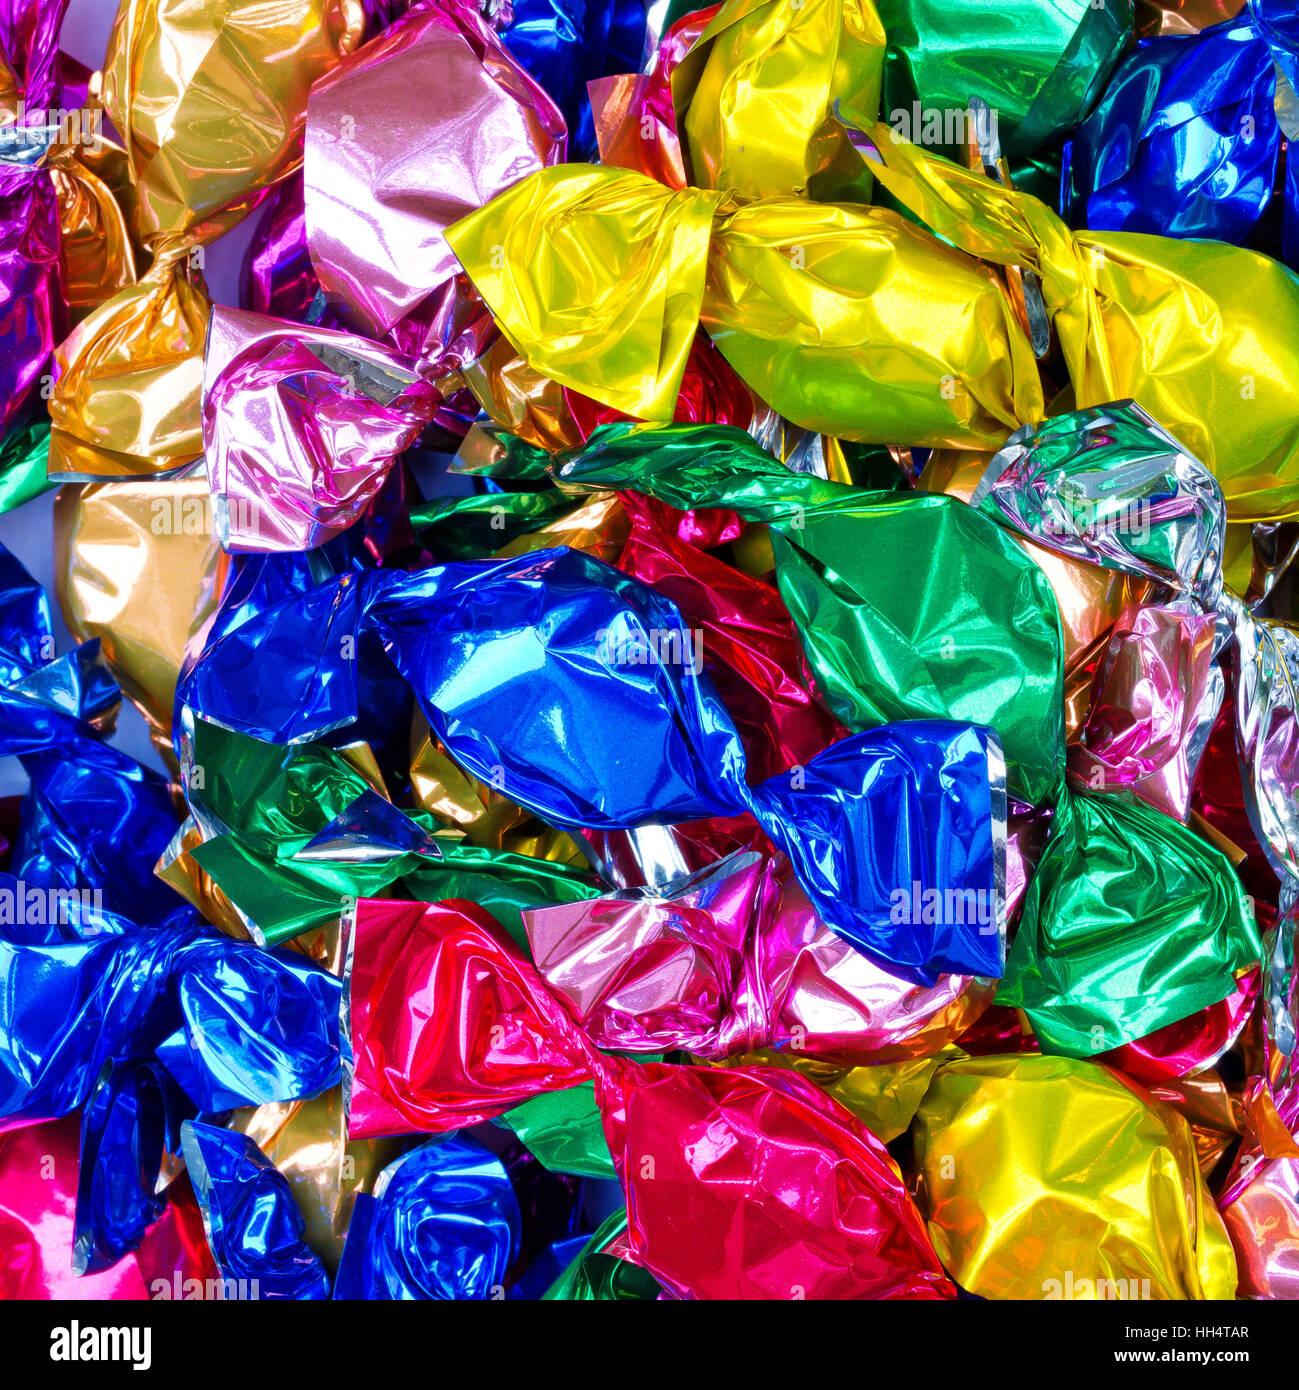 Hintergrund mit bunten bonbons Stockbild